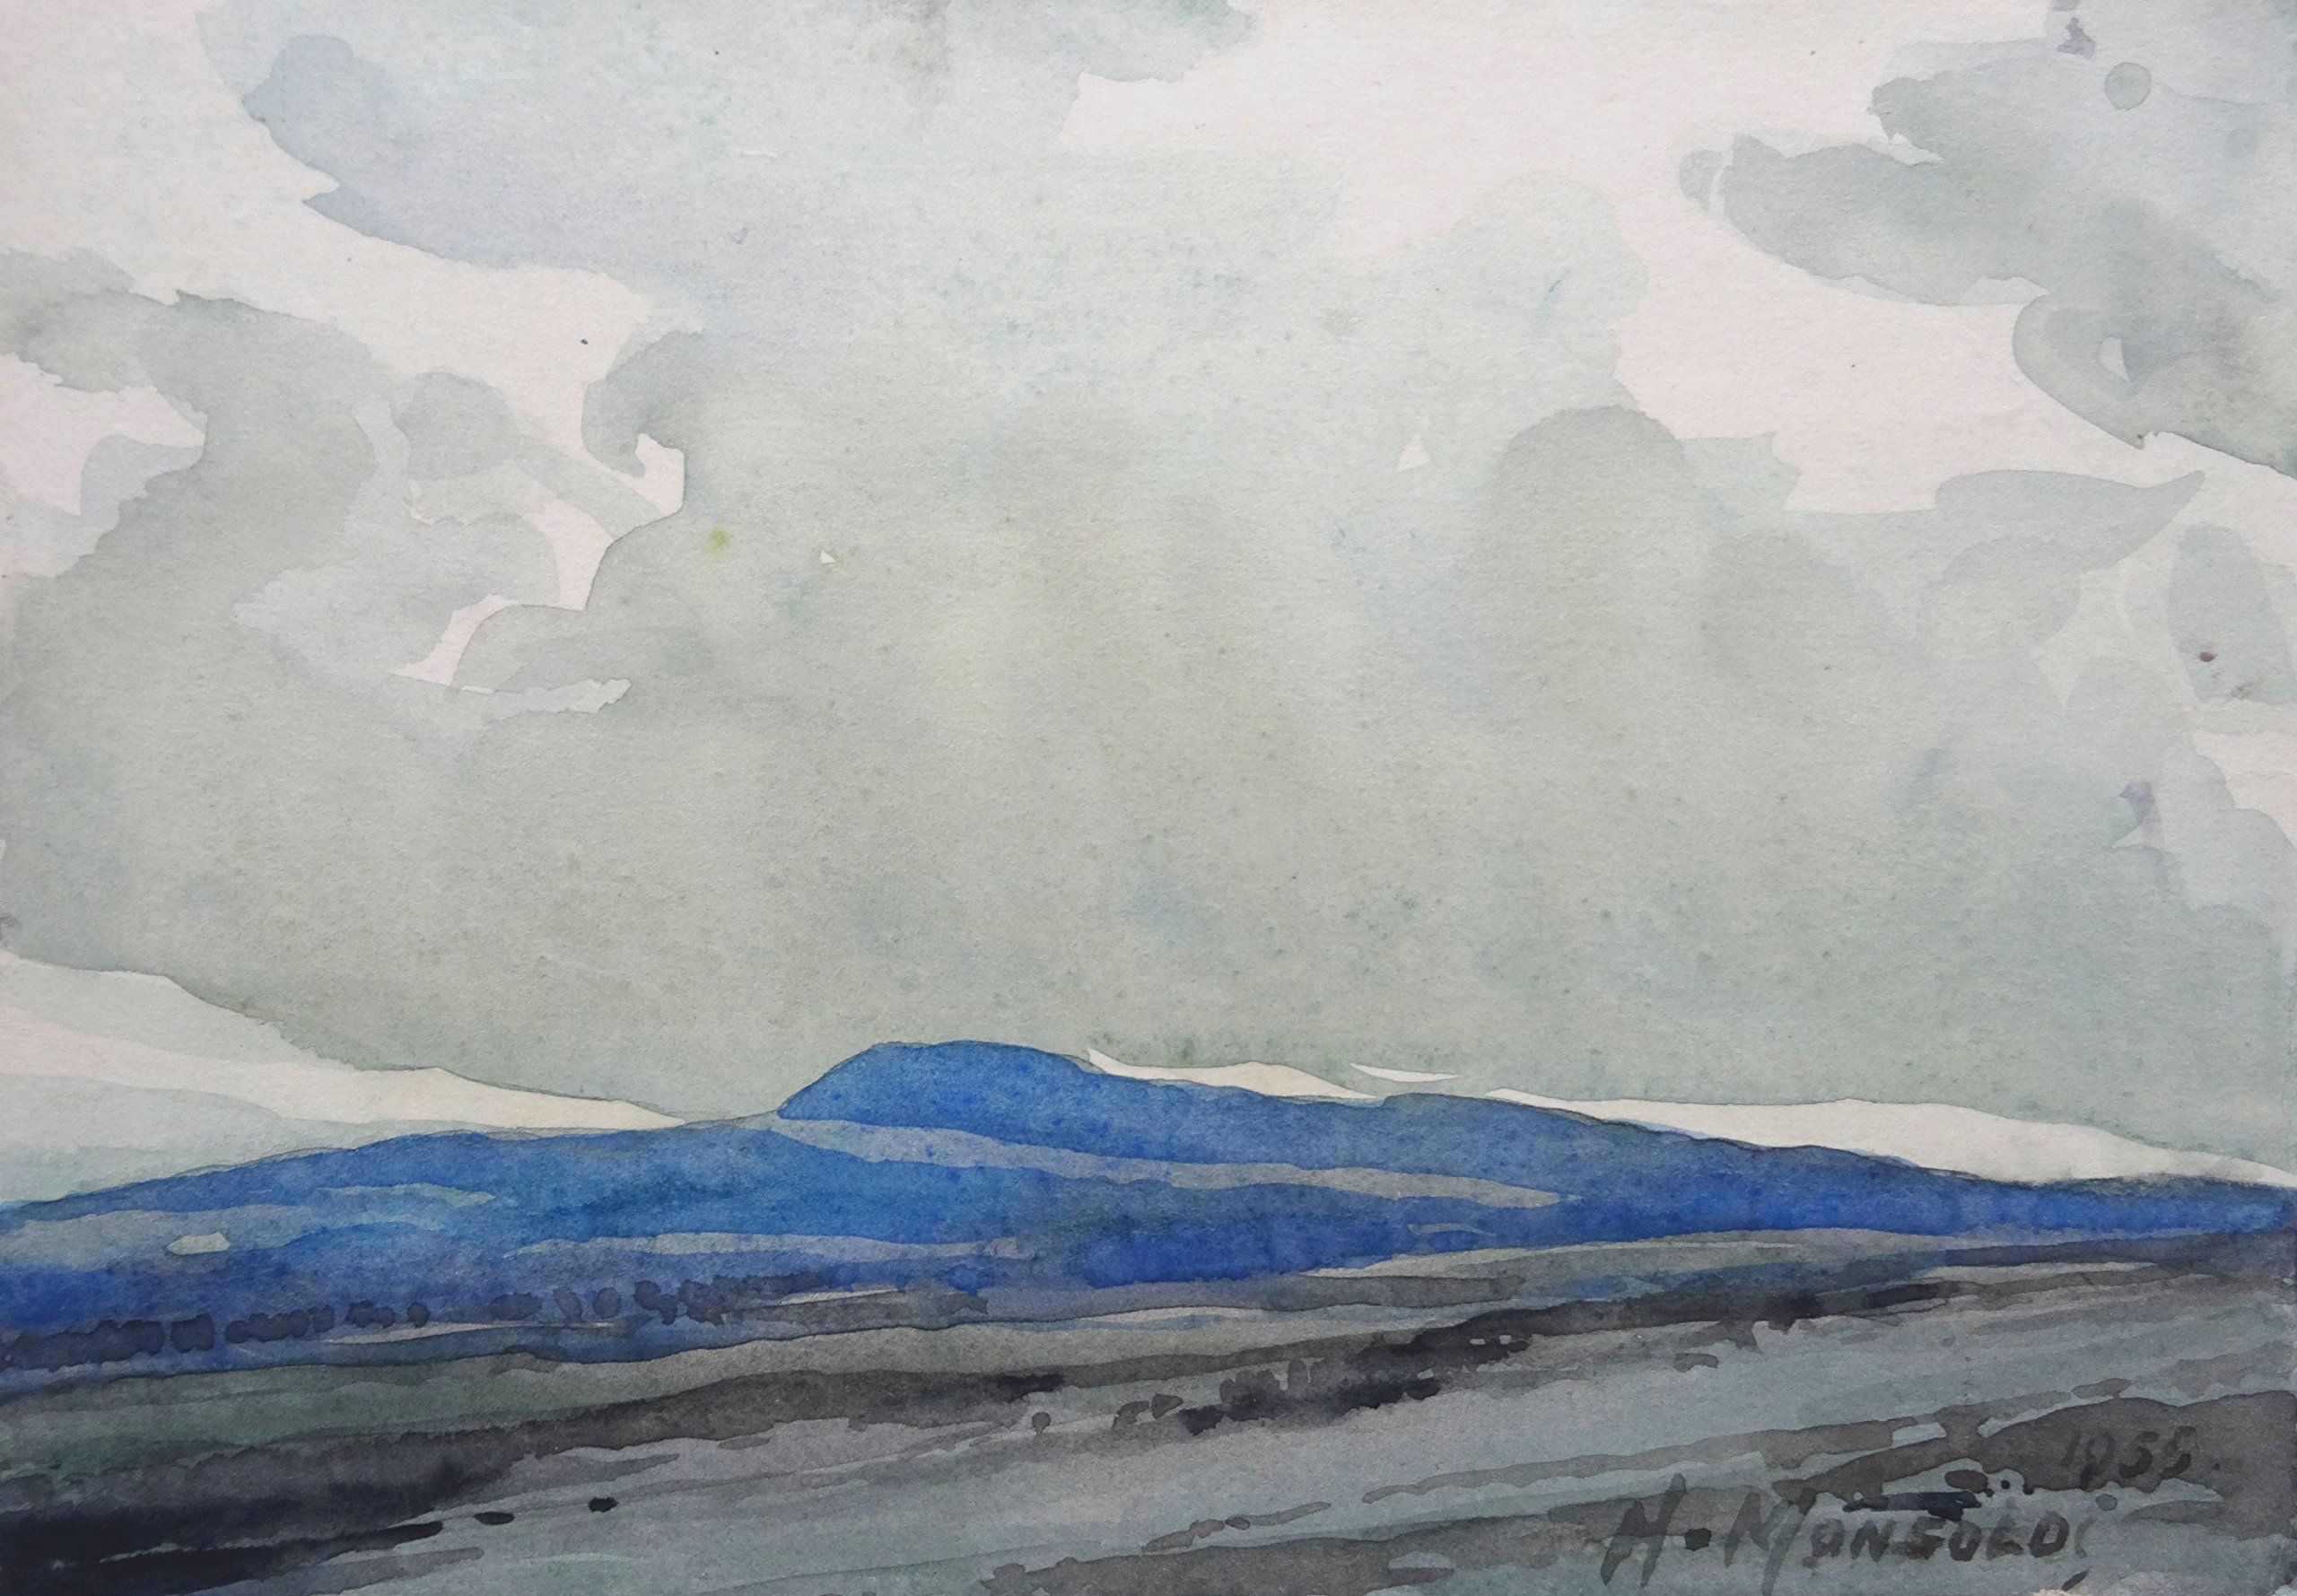 Mountain Landscape Mountain Landscape By Herberts Mangolds Watercolor On Paper 14 5x20 5 Cm Painting Mountain Landscape Landscape